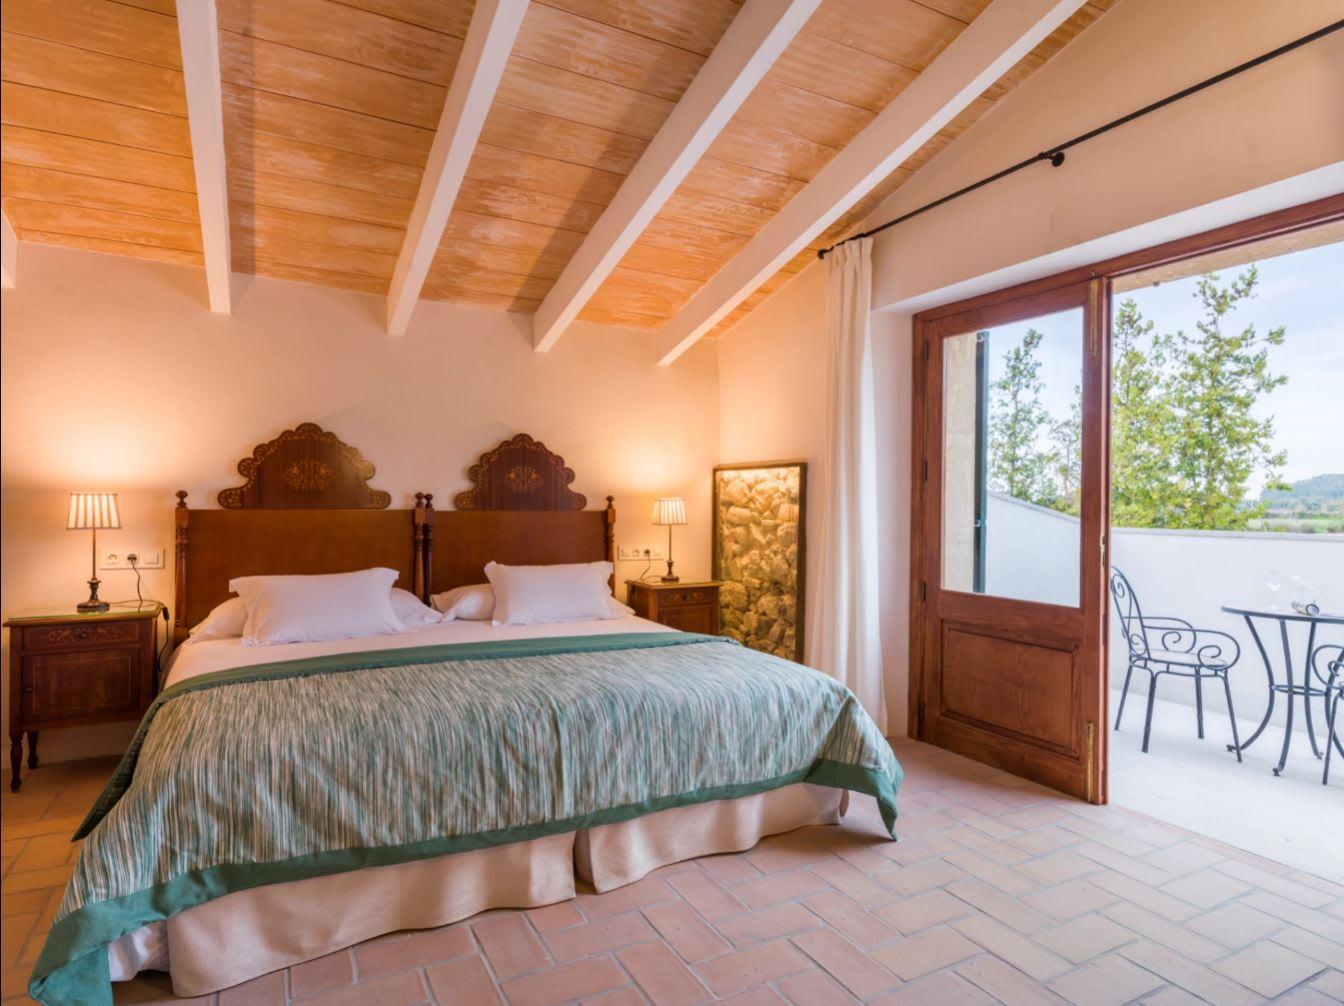 Vacation Rental Agroturisme Gossalba Sant Joan Trivago Com